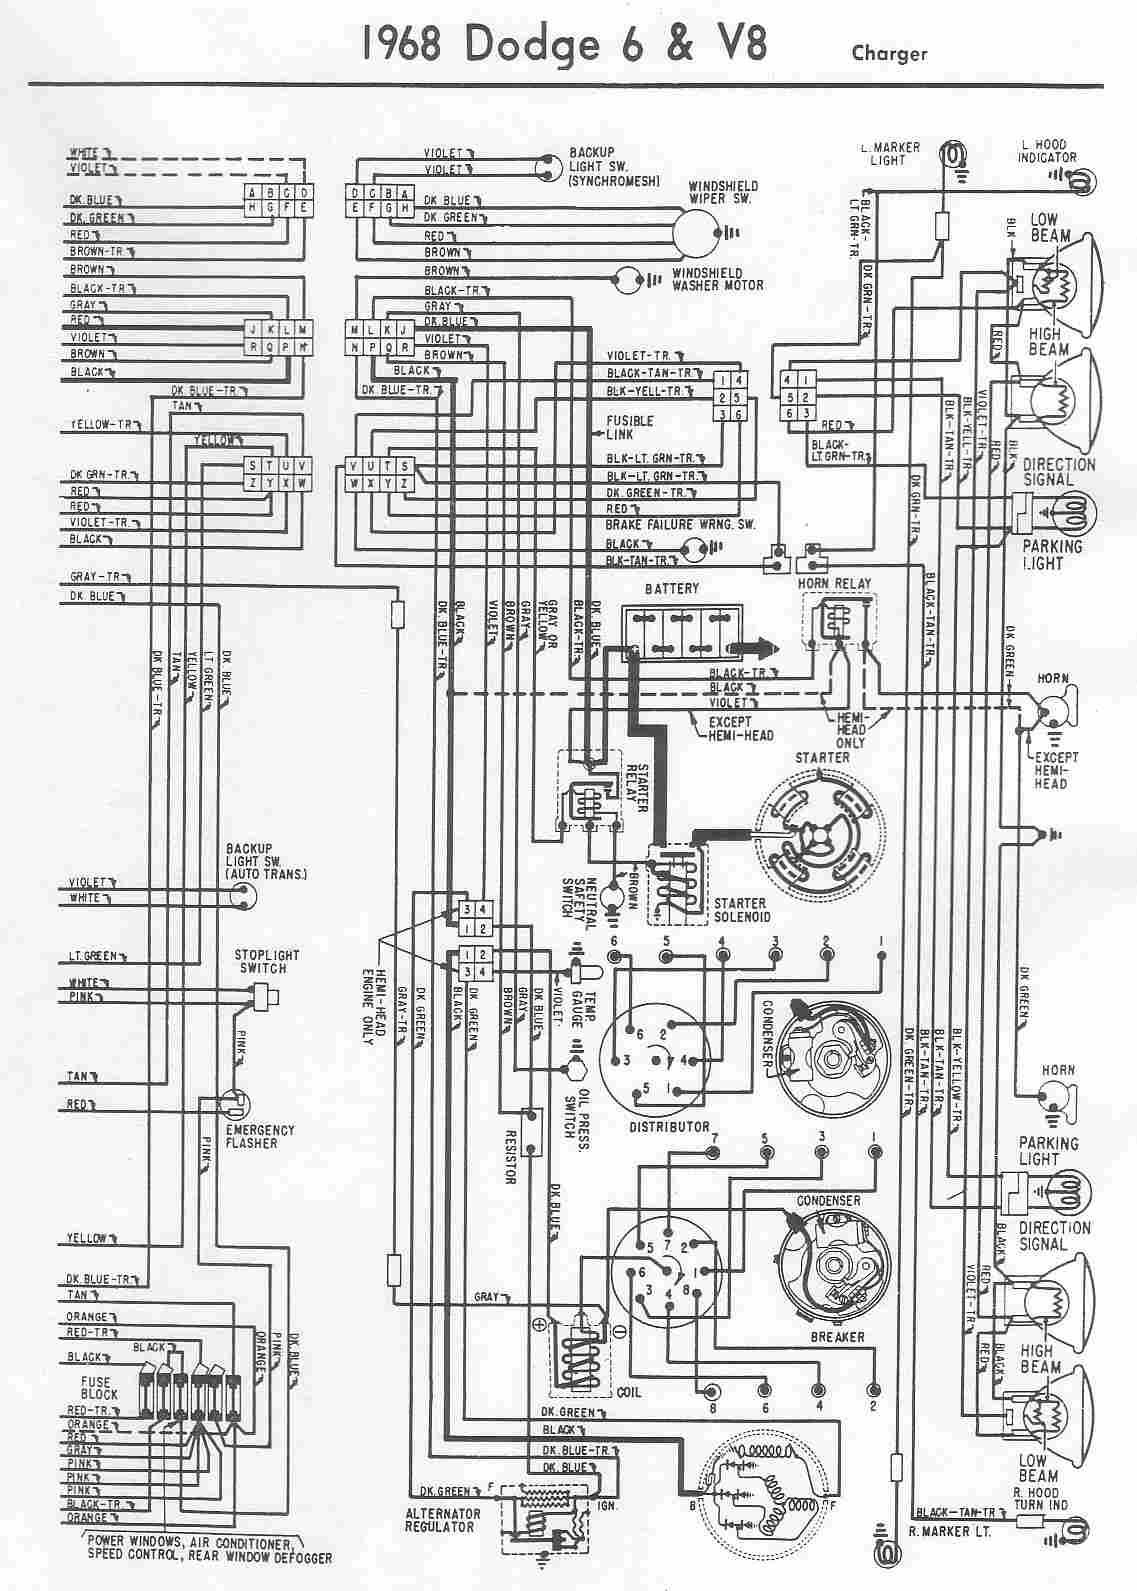 small resolution of 2003 dodge stratus 2 7 engine diagram wiring library rh 99 mac happen de 04 dodge stratus engine diagram 2001 dodge stratus engine diagram